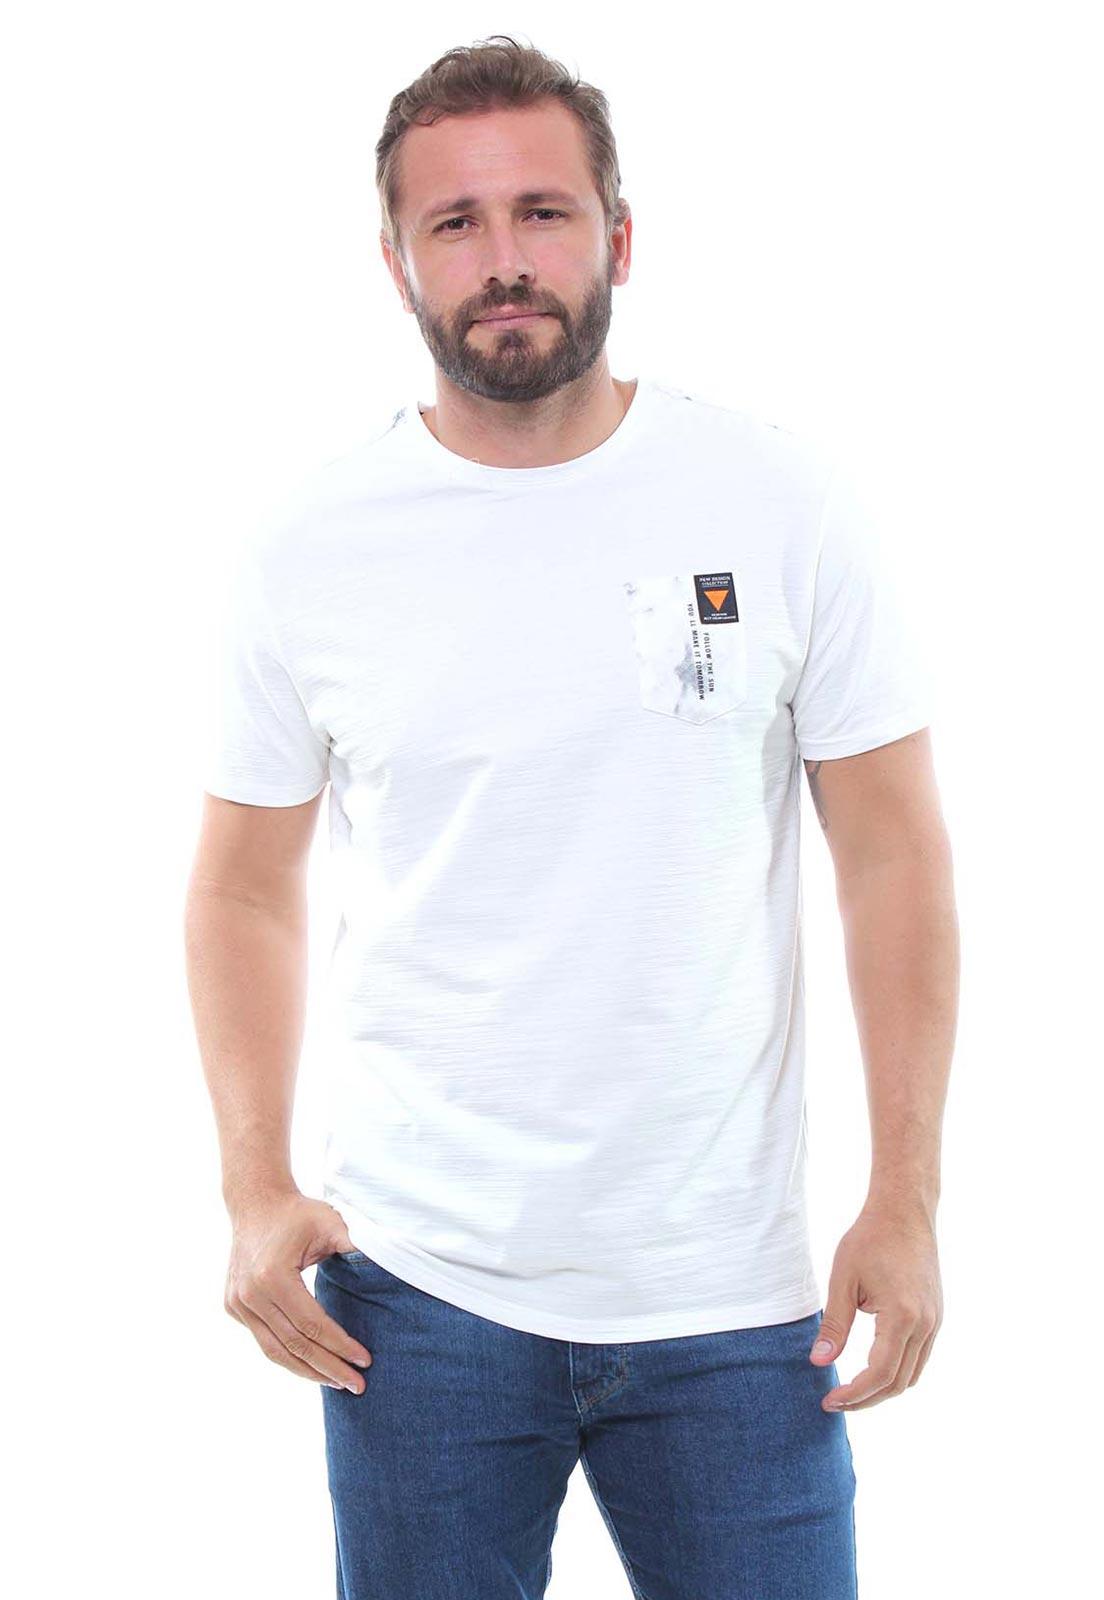 Camiseta Masculina Manga Curta Crocker - 47843  - CROCKER JEANS